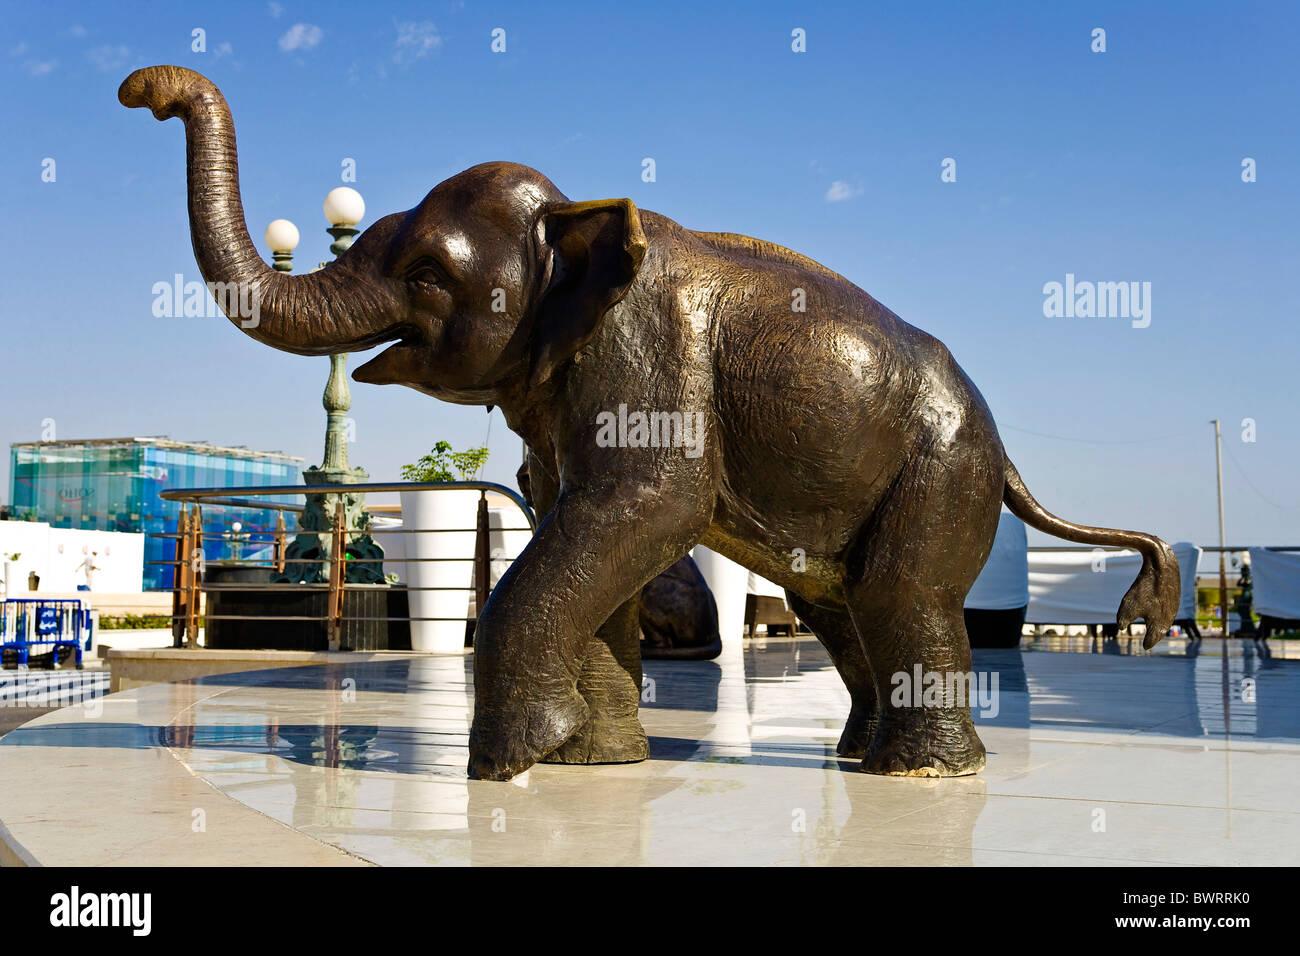 Bronze Elephant Sculpture Stock Photos & Bronze Elephant Sculpture